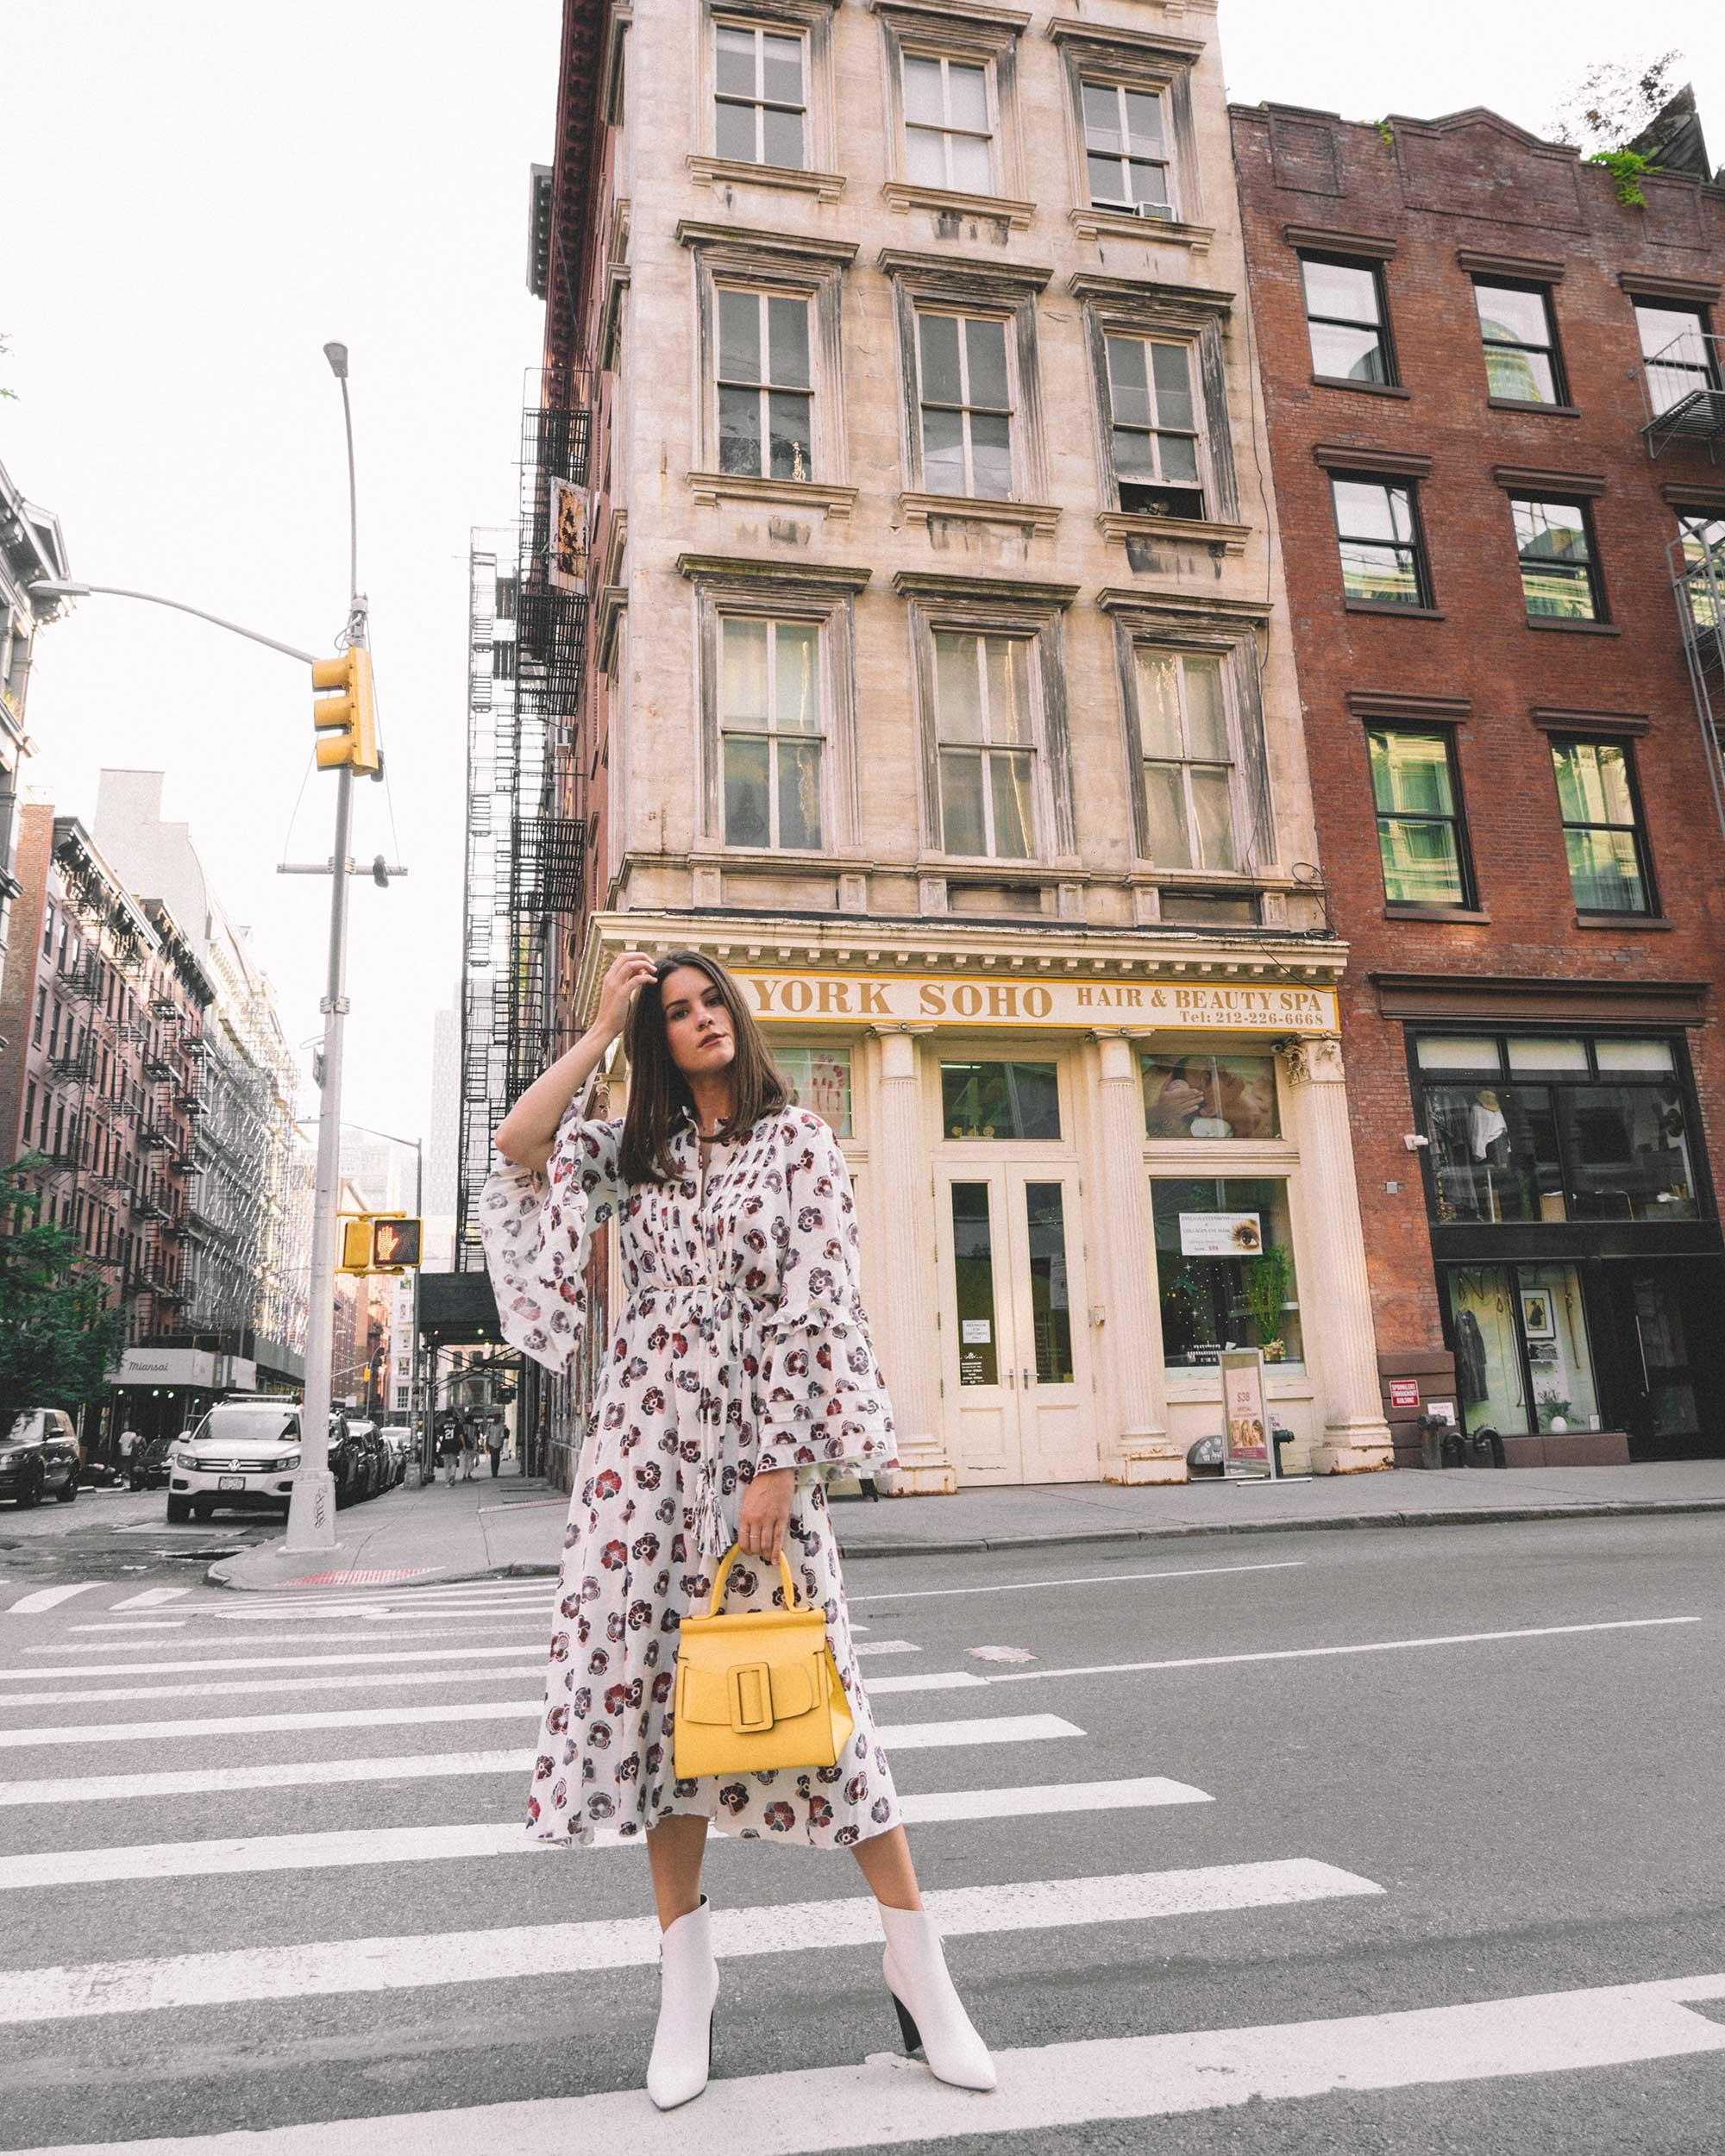 Madewell x Karen Walker Floral Fantasia Ruffled Dress and BOYY Karl 24 Bag soho new york fashion week outfit3.jpg